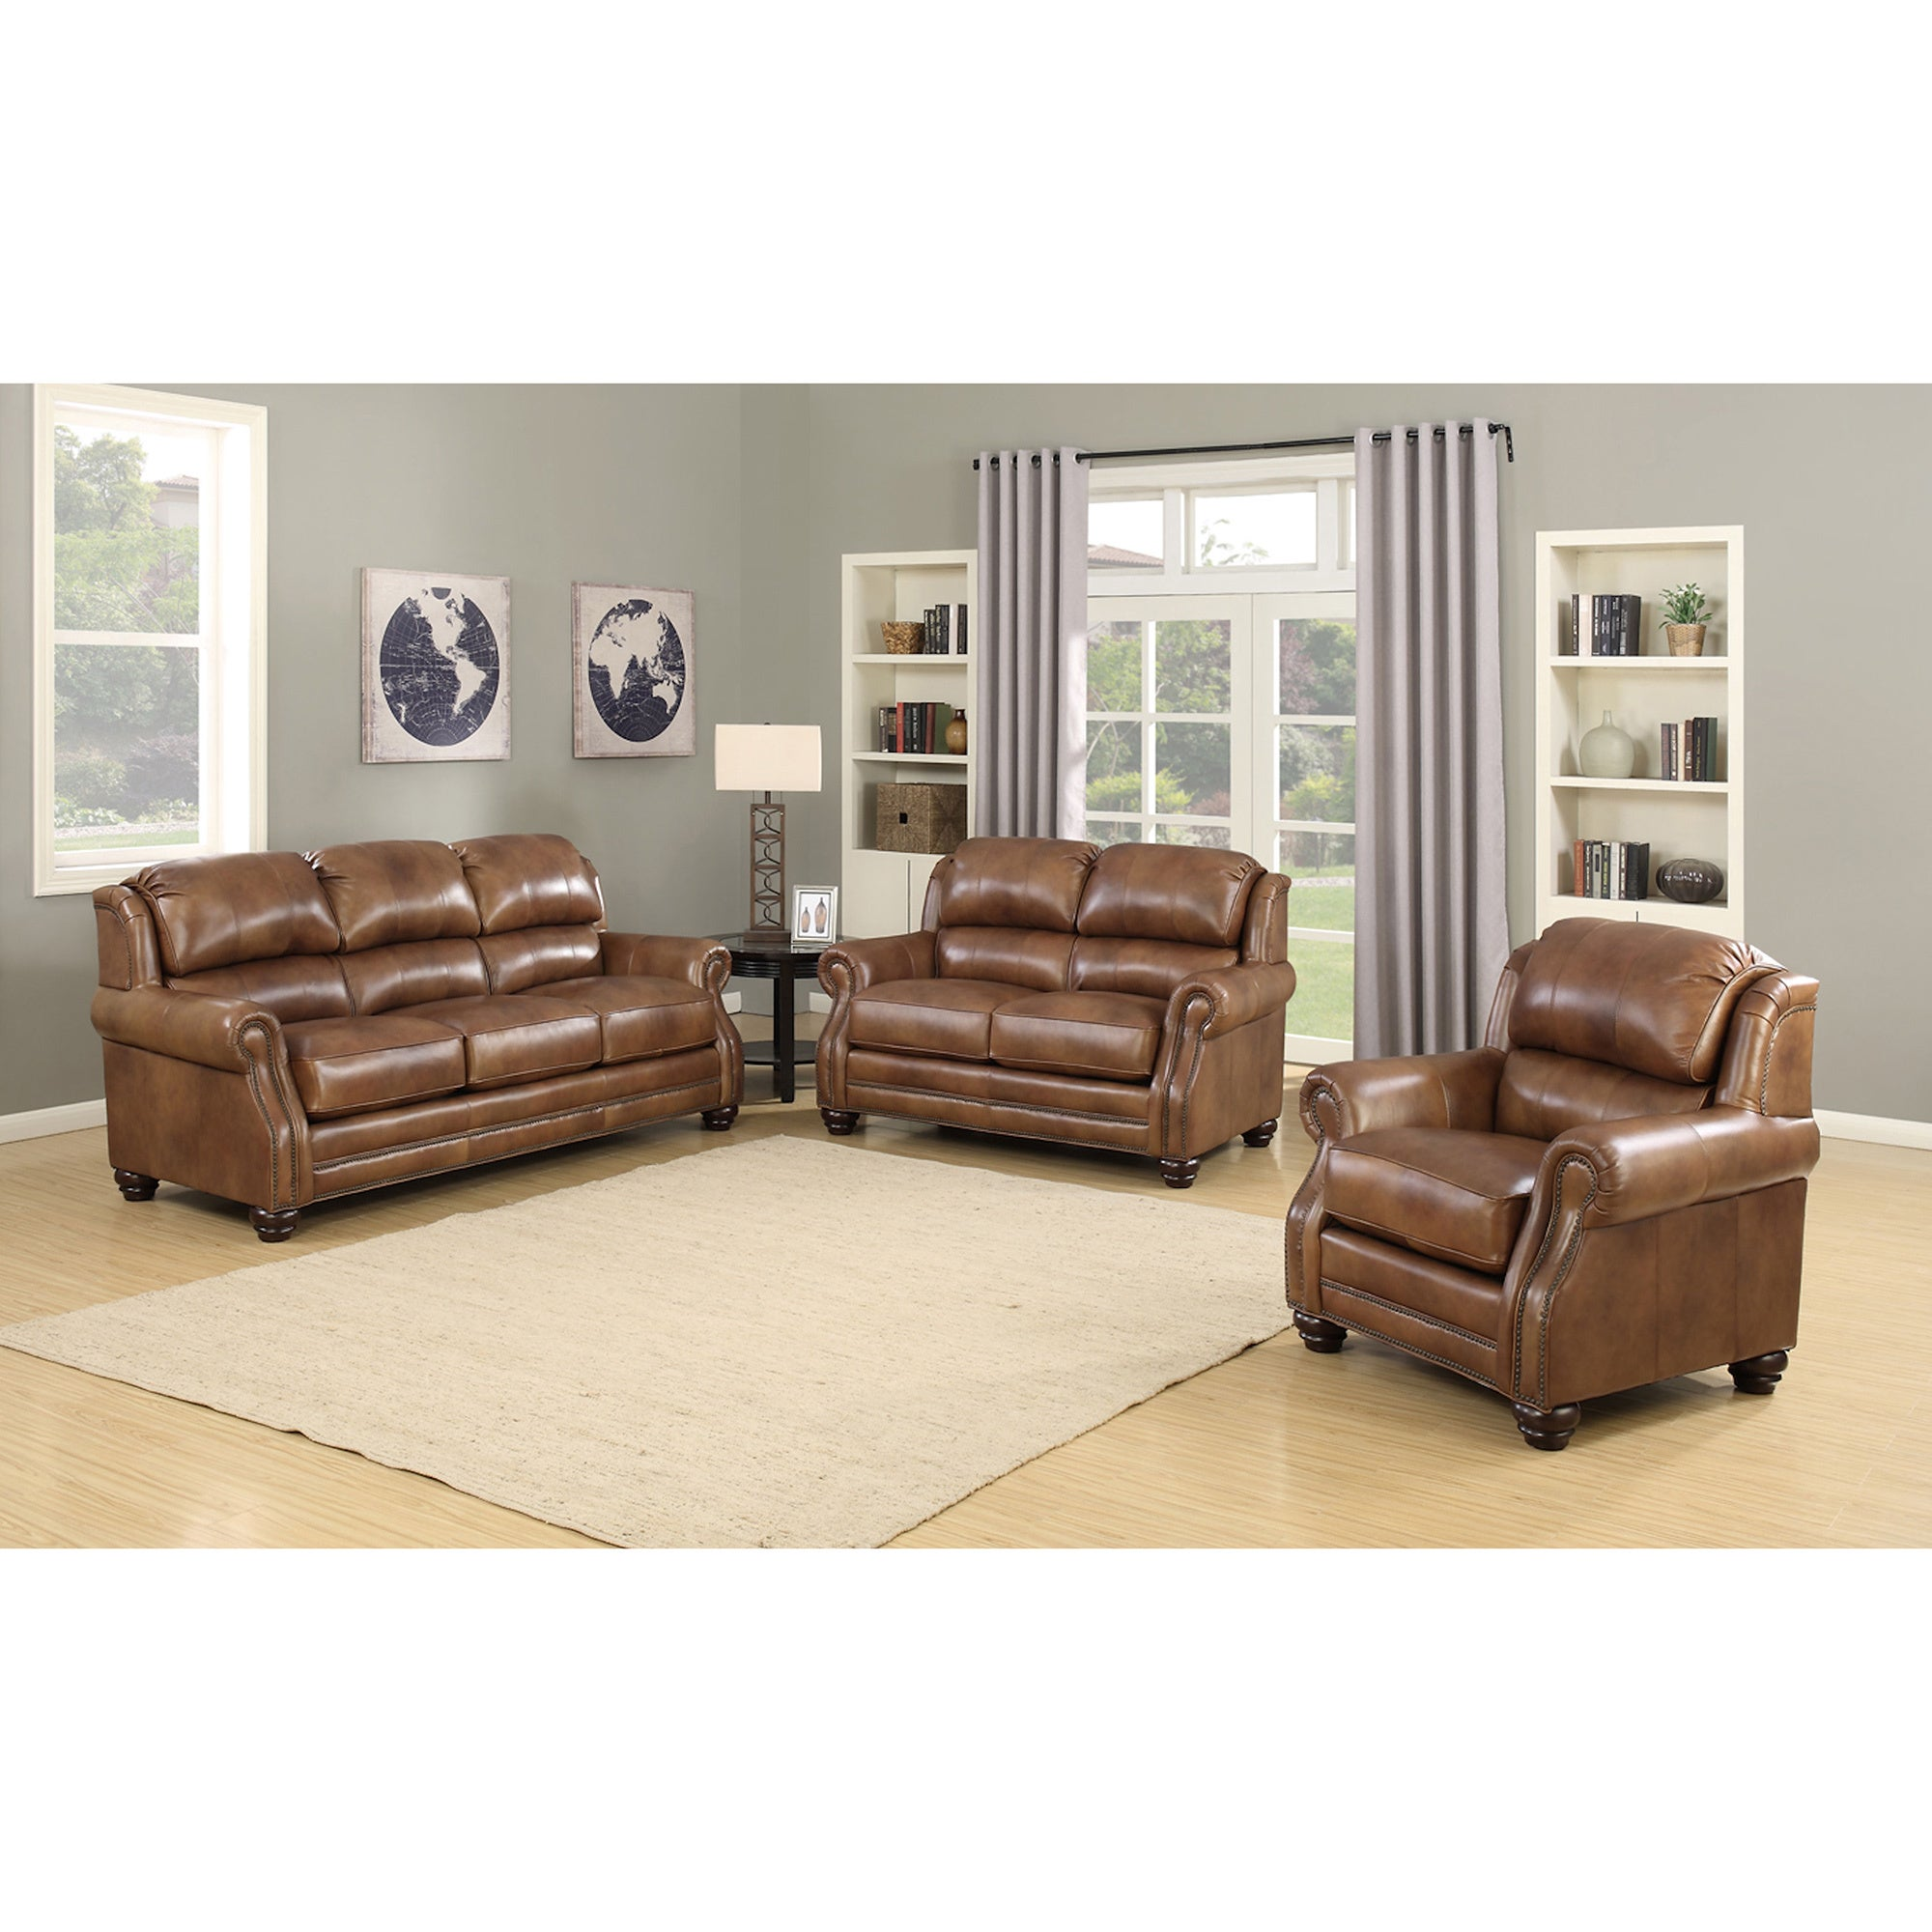 Bentley Premium Italian Leather Sectional Sofa